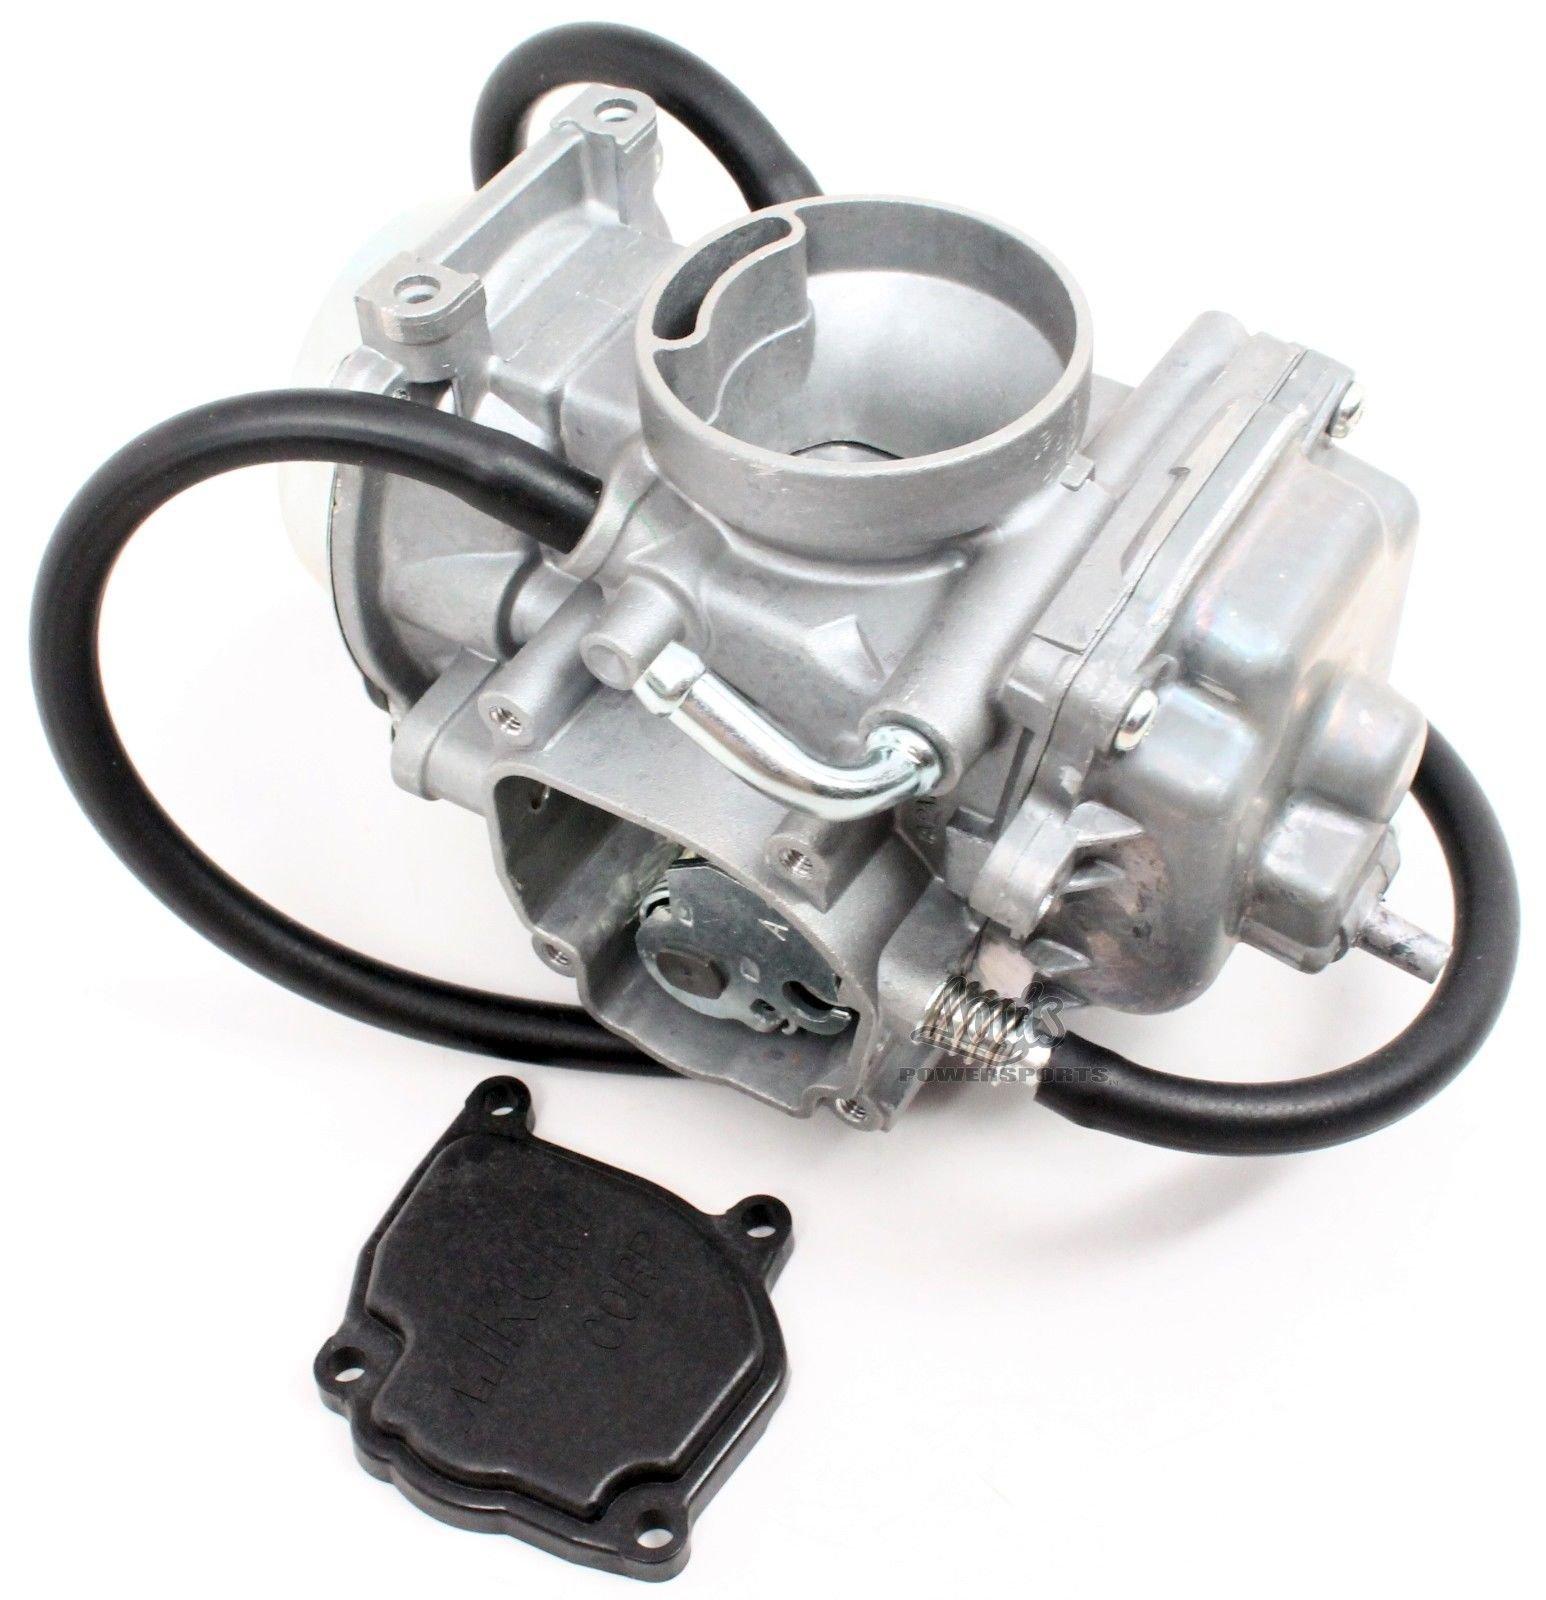 Arctic Cat 1998 1999 2000 ATV 98 99 00 300 2x4 4x4 Carburetor Complete Carb Assembly 0470-348 New OEM